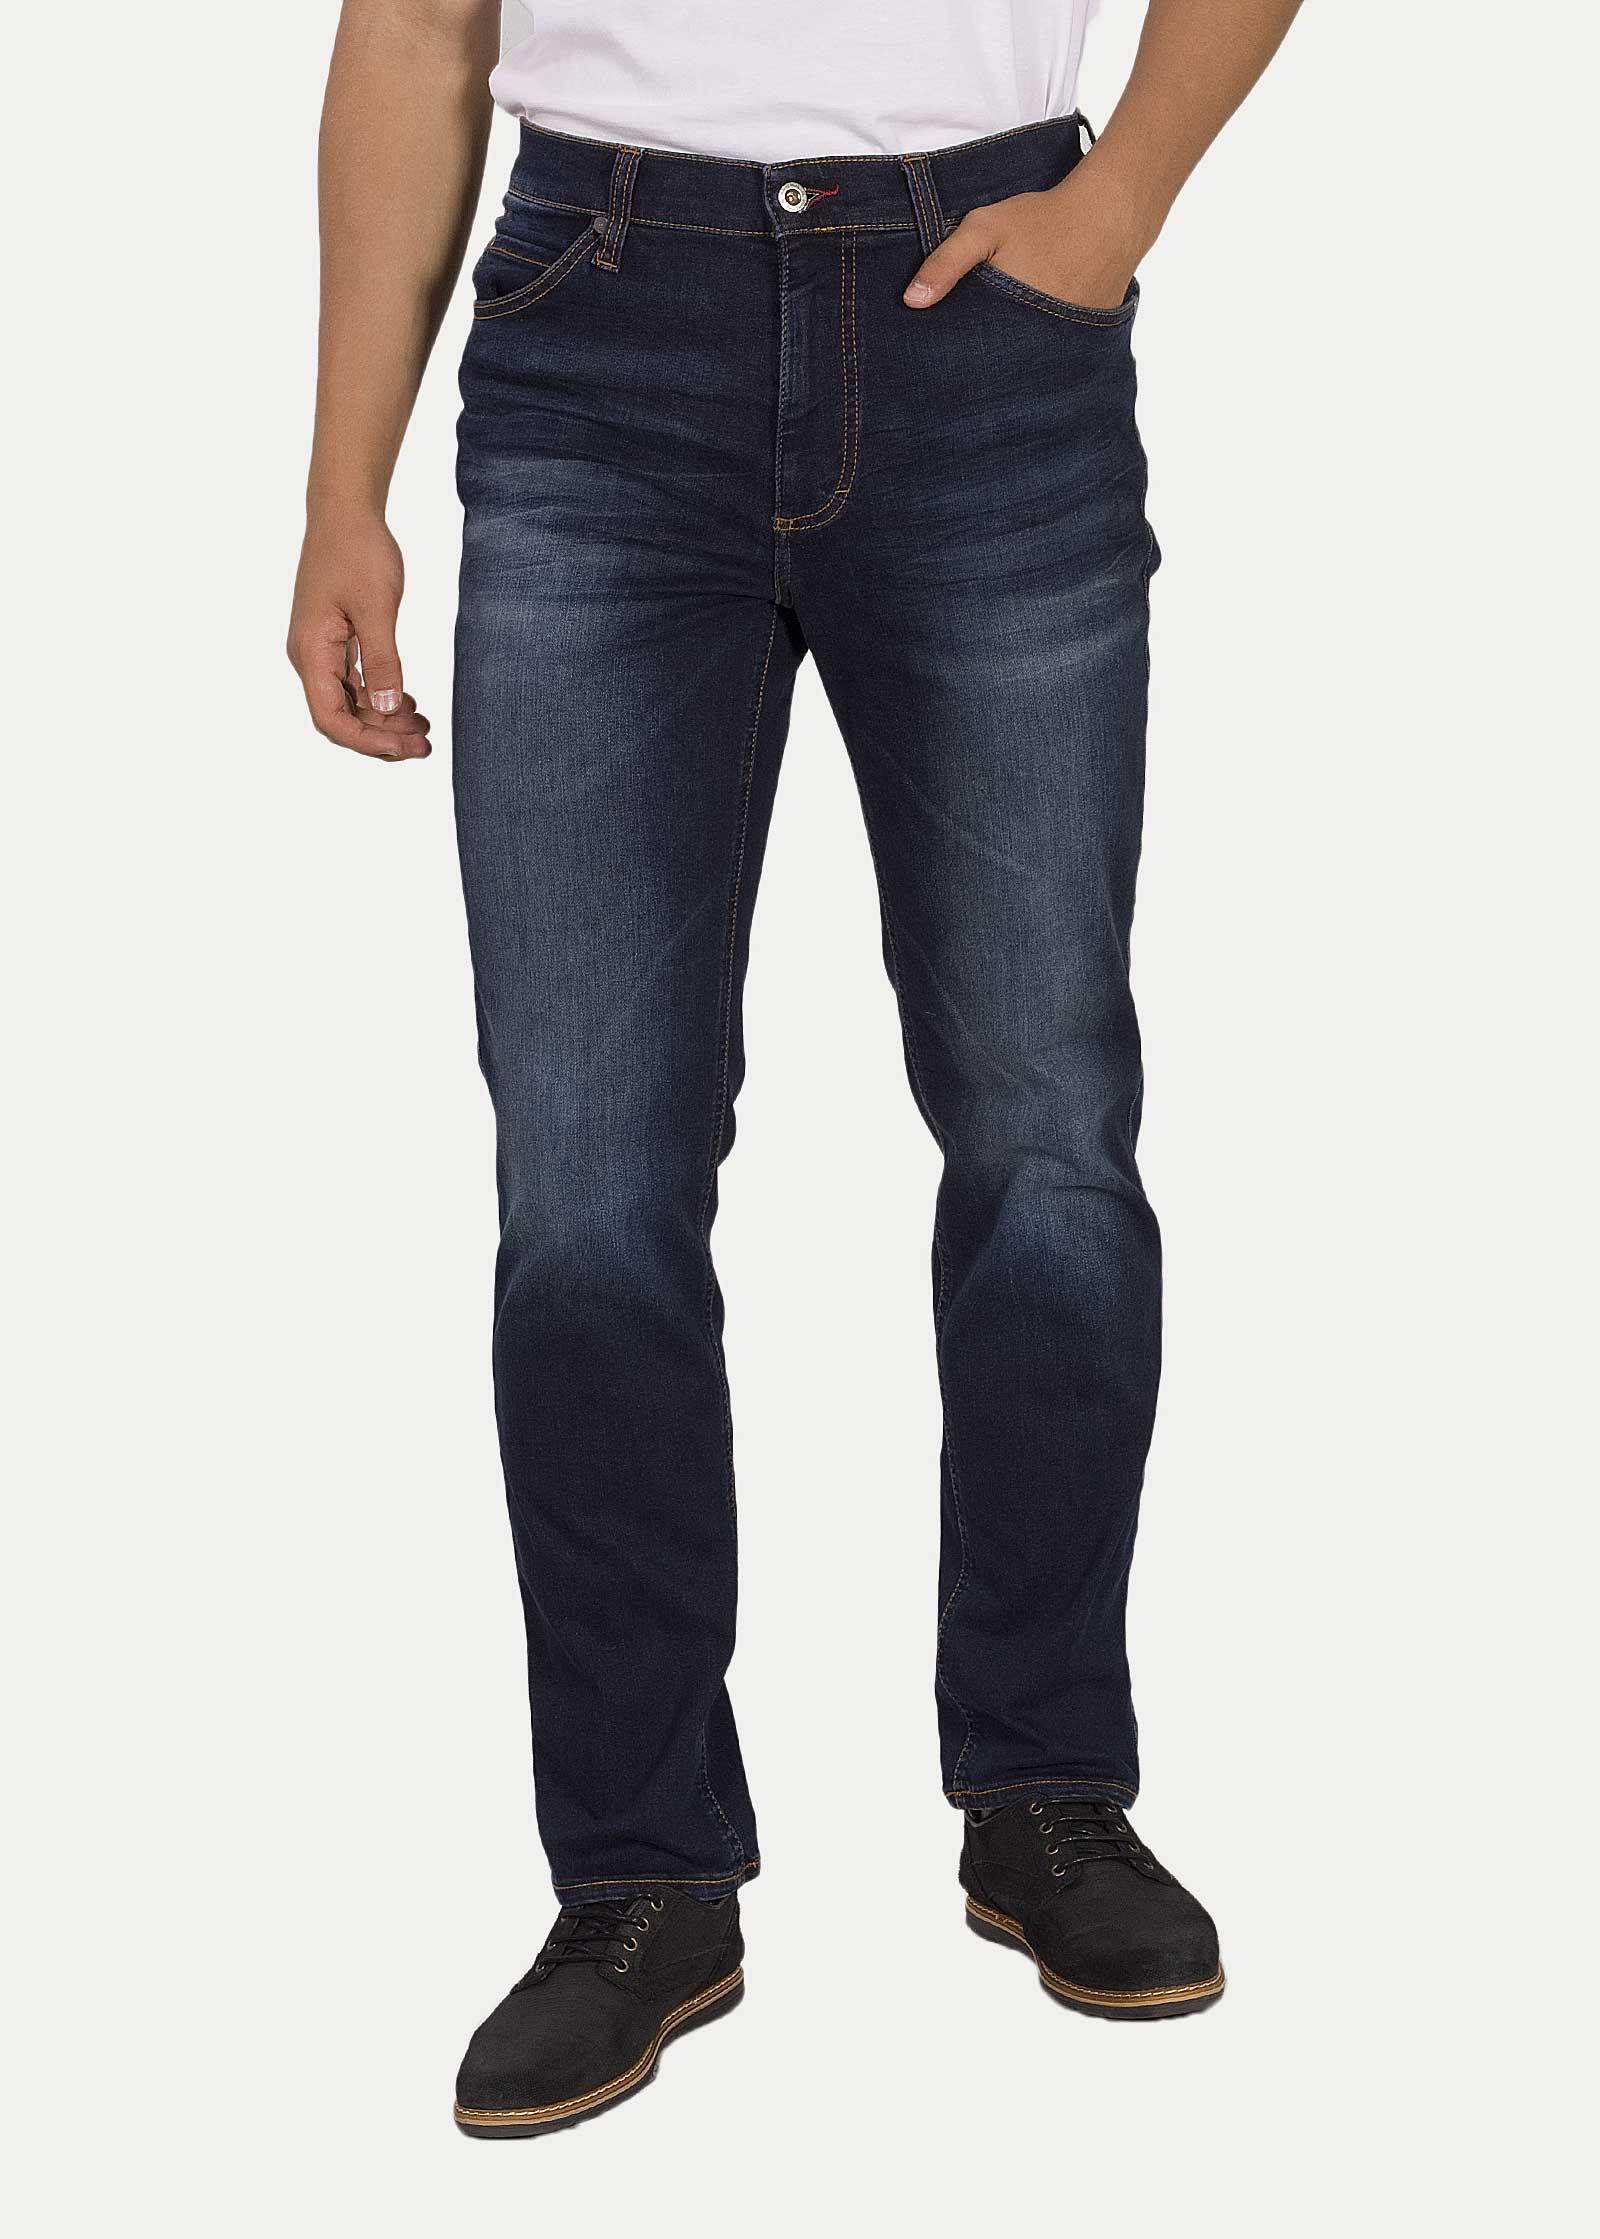 Men's Jeans Mustang® Tramper Tapered - 883 Denim Blue 1004457-5000-883 /  Navy blue